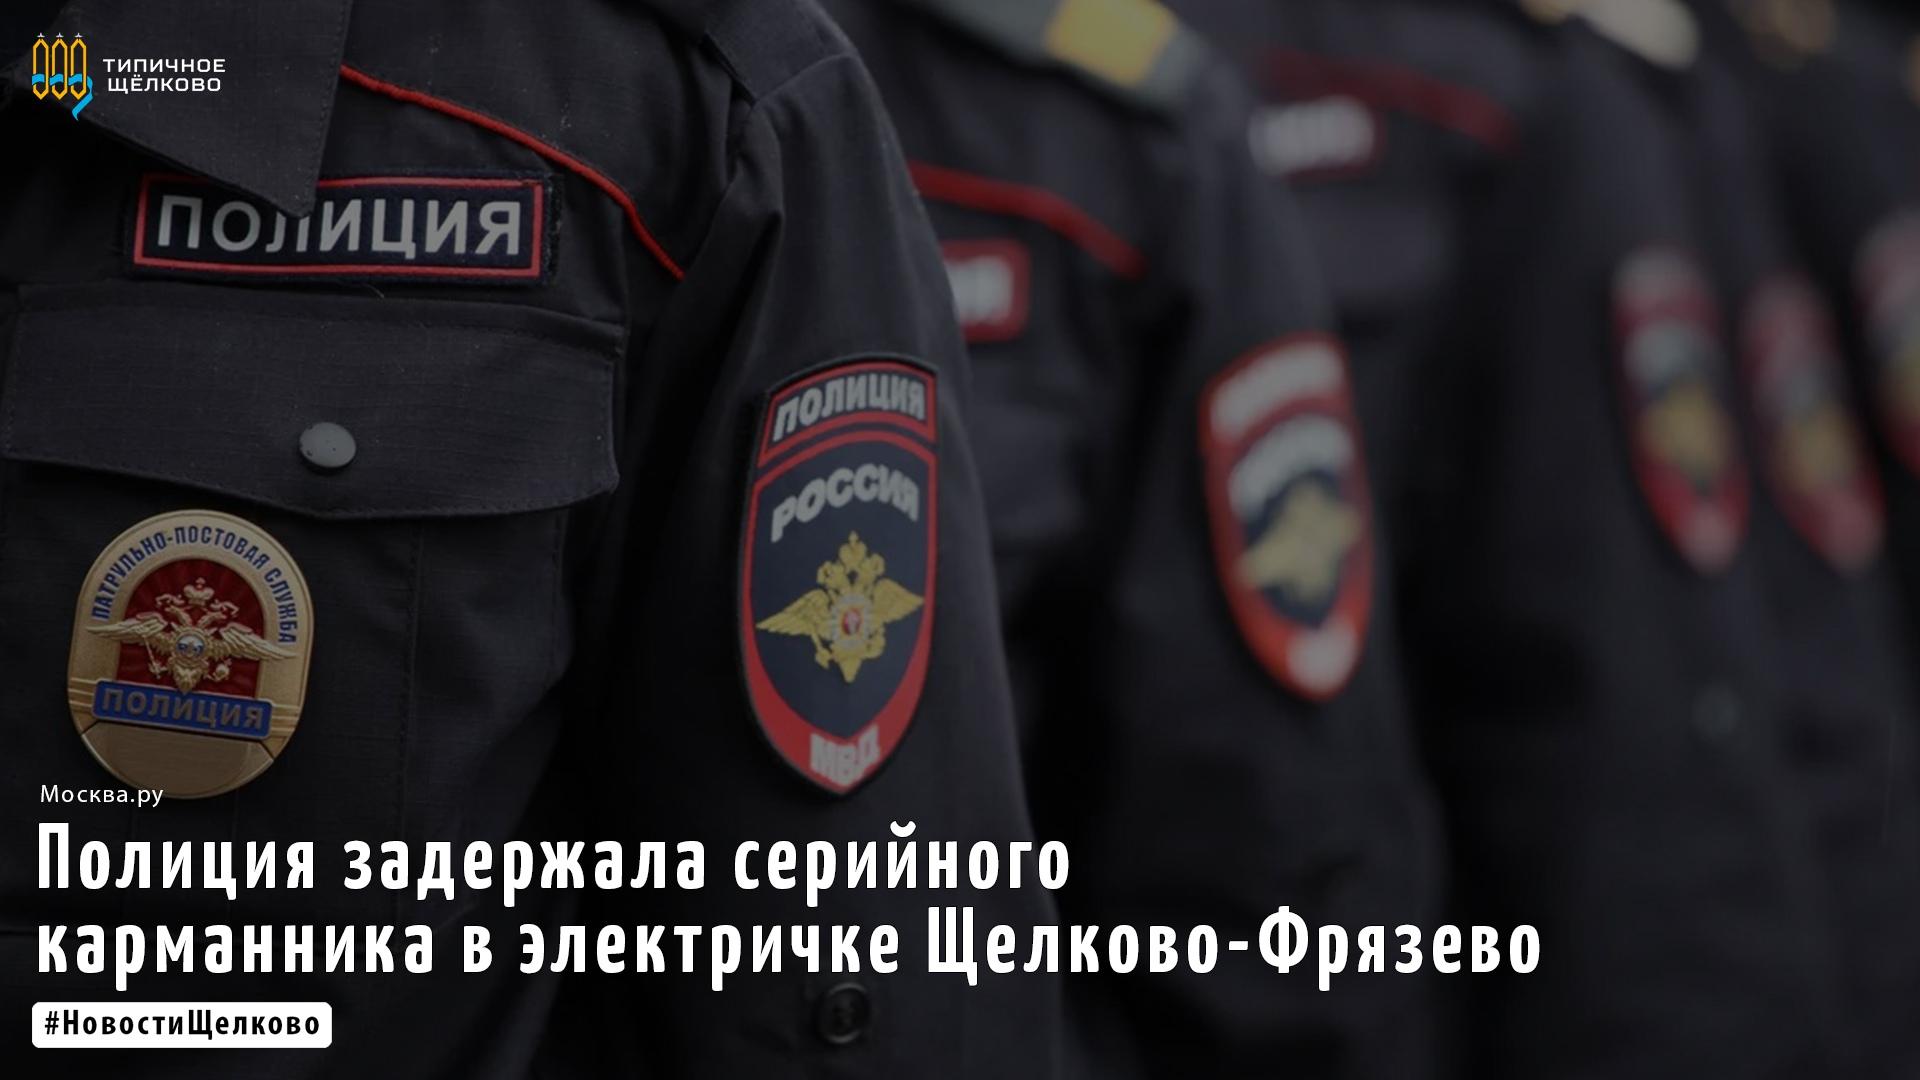 Полиция на транспорте задержала подозреваемого в разбойном нападении на пассажира электрички Щелково-Фрязево.